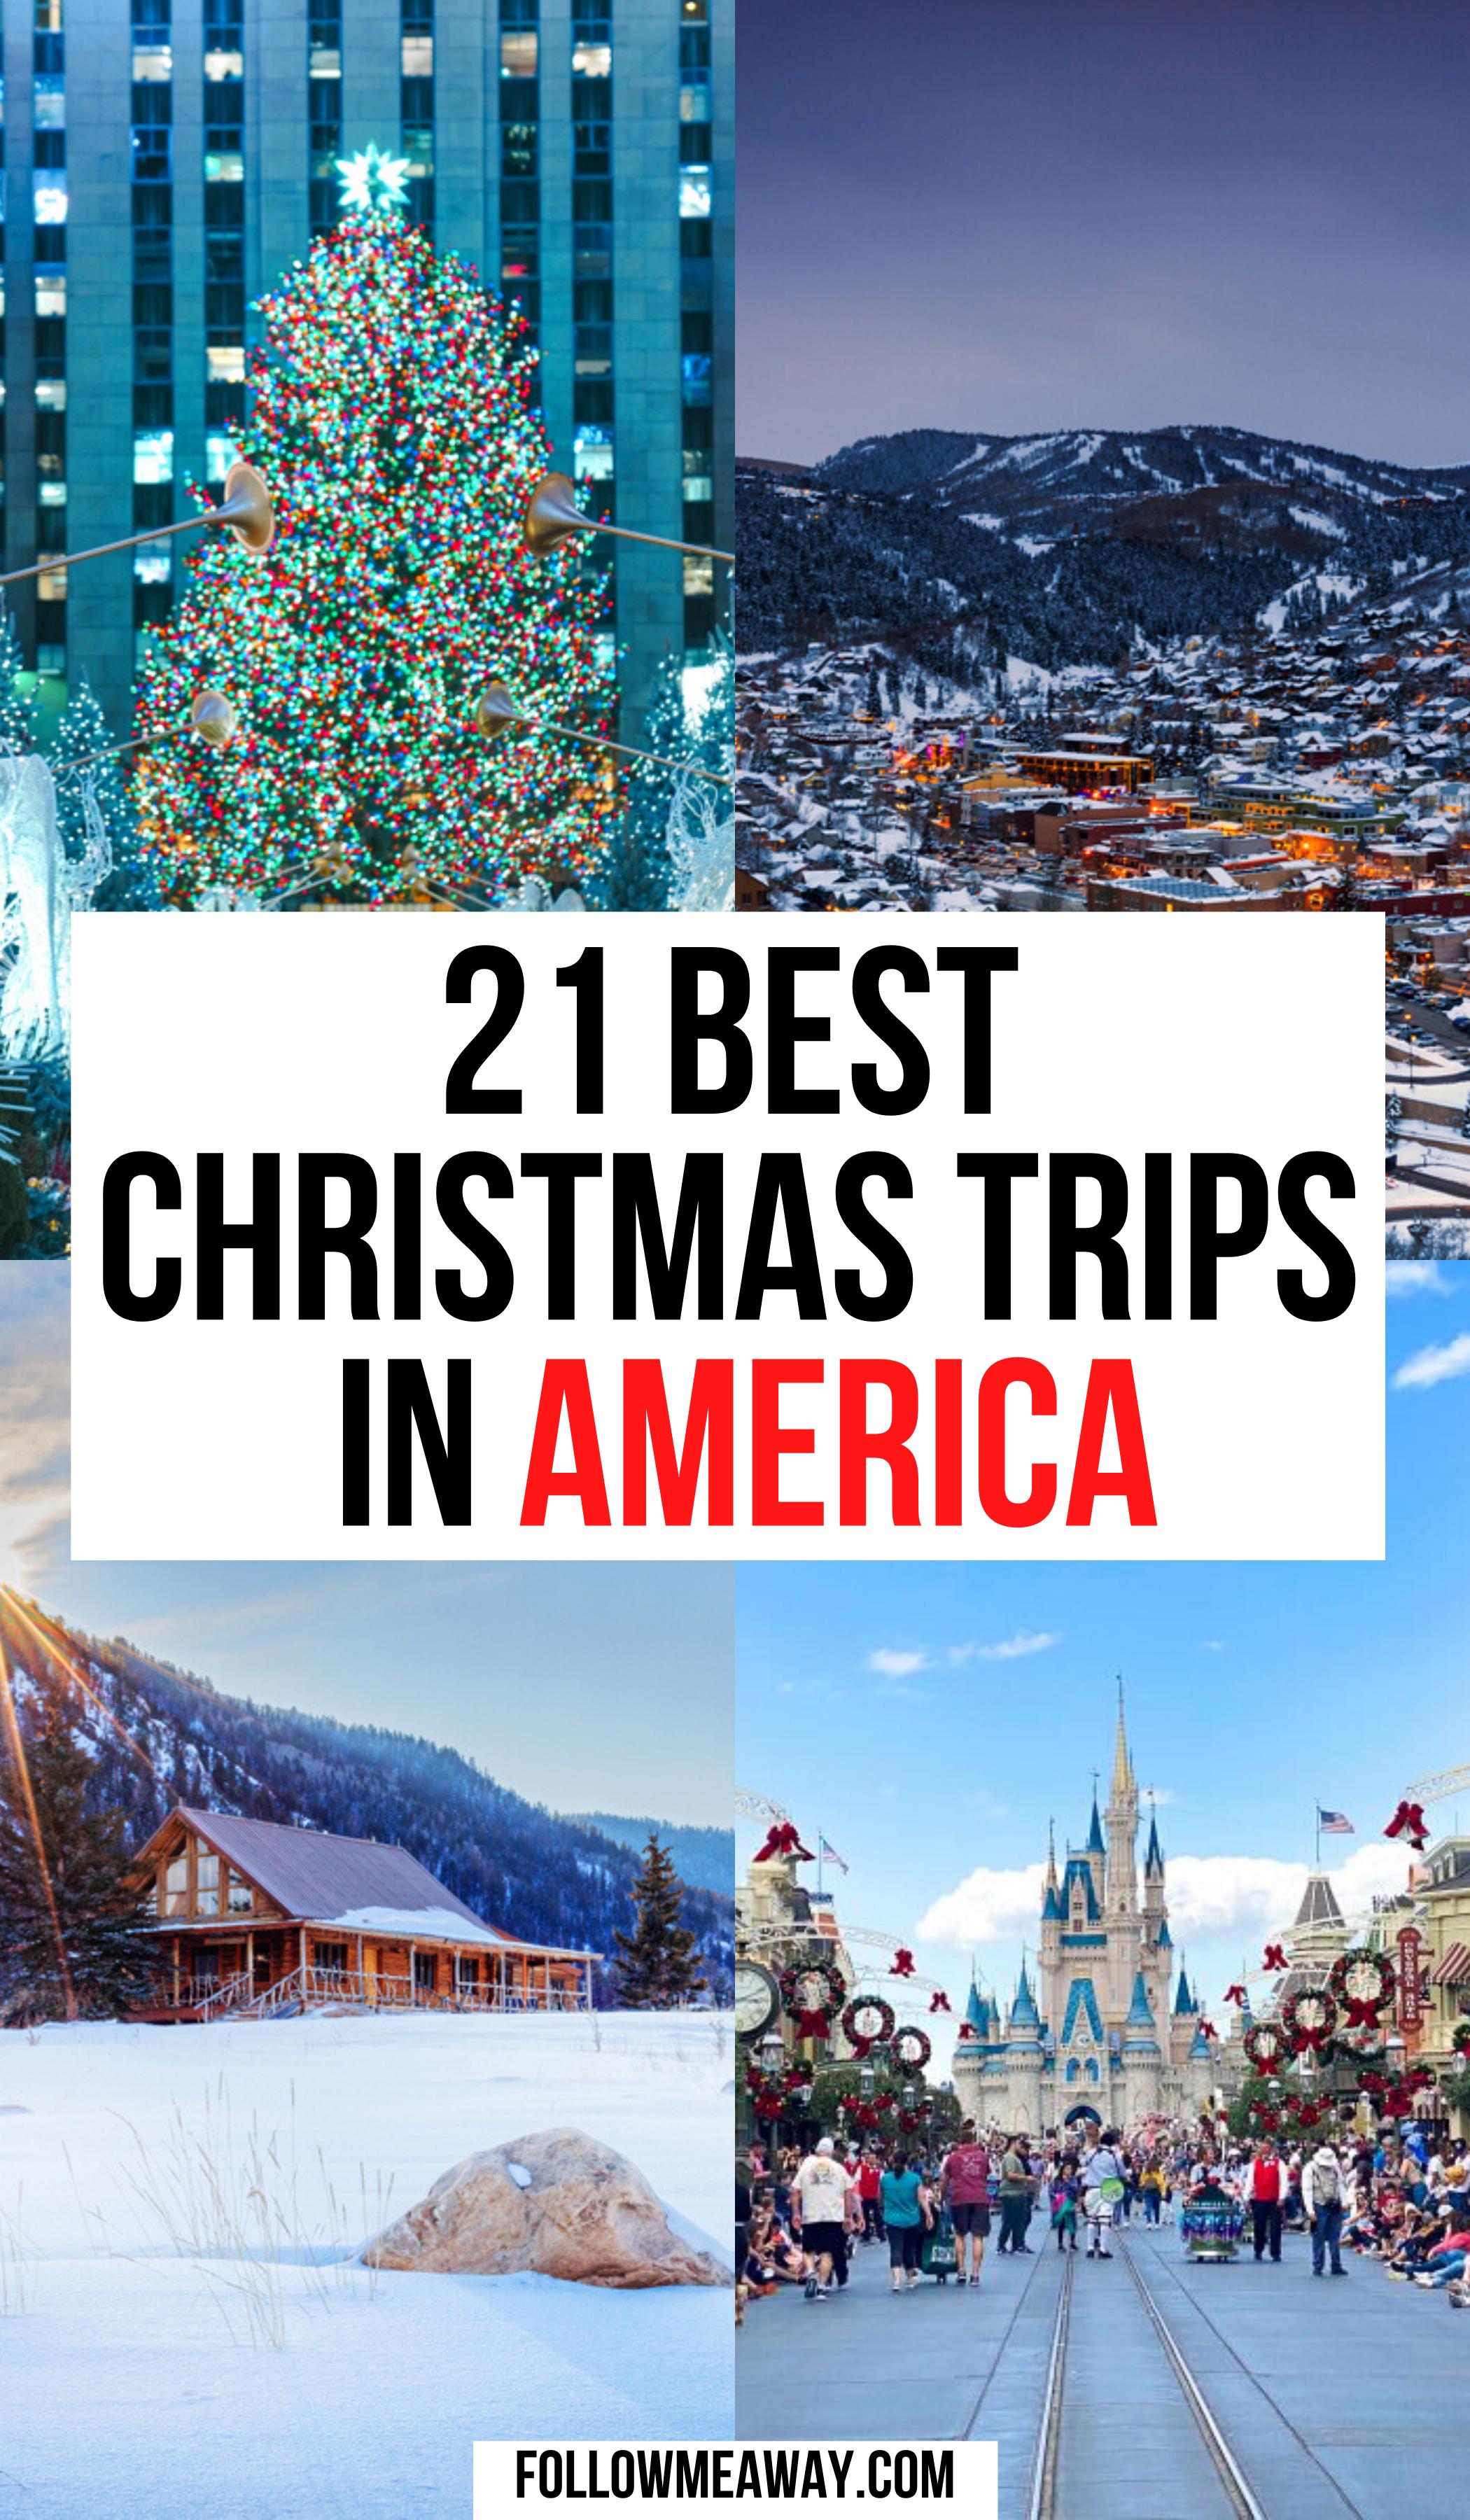 21 Best Christmas Trips in America